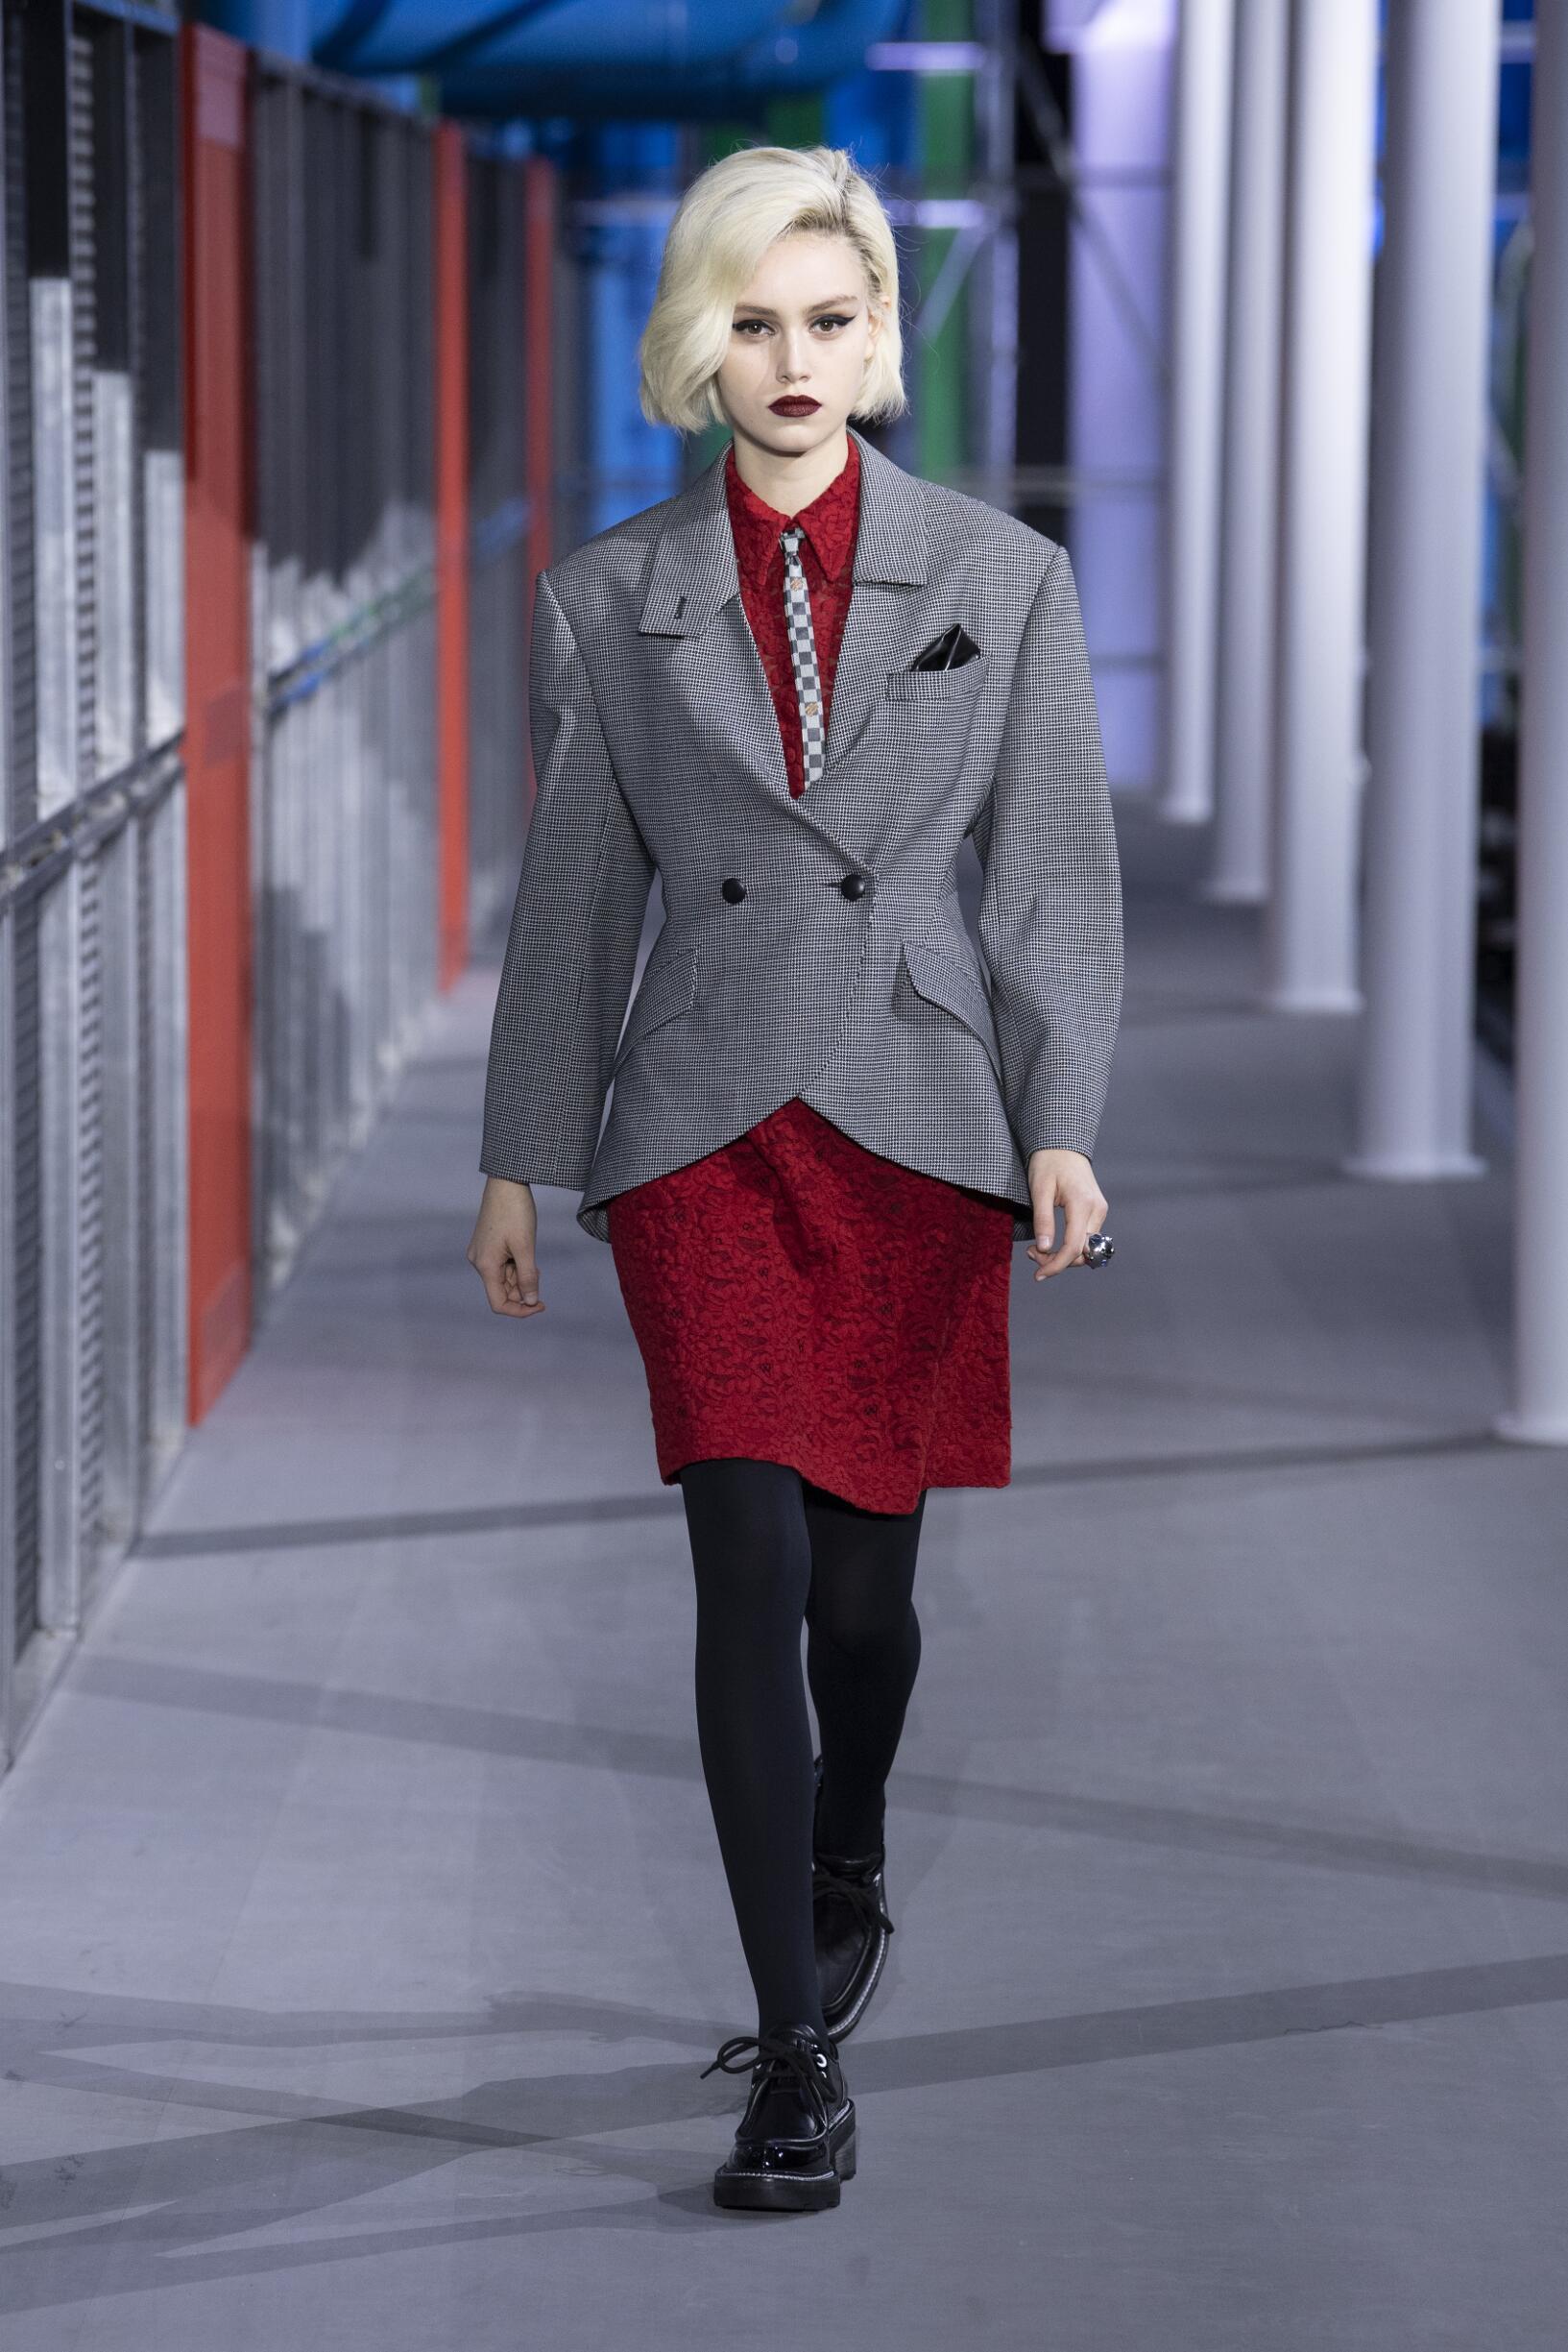 Fall Winter Fashion Trends 2019 Louis Vuitton